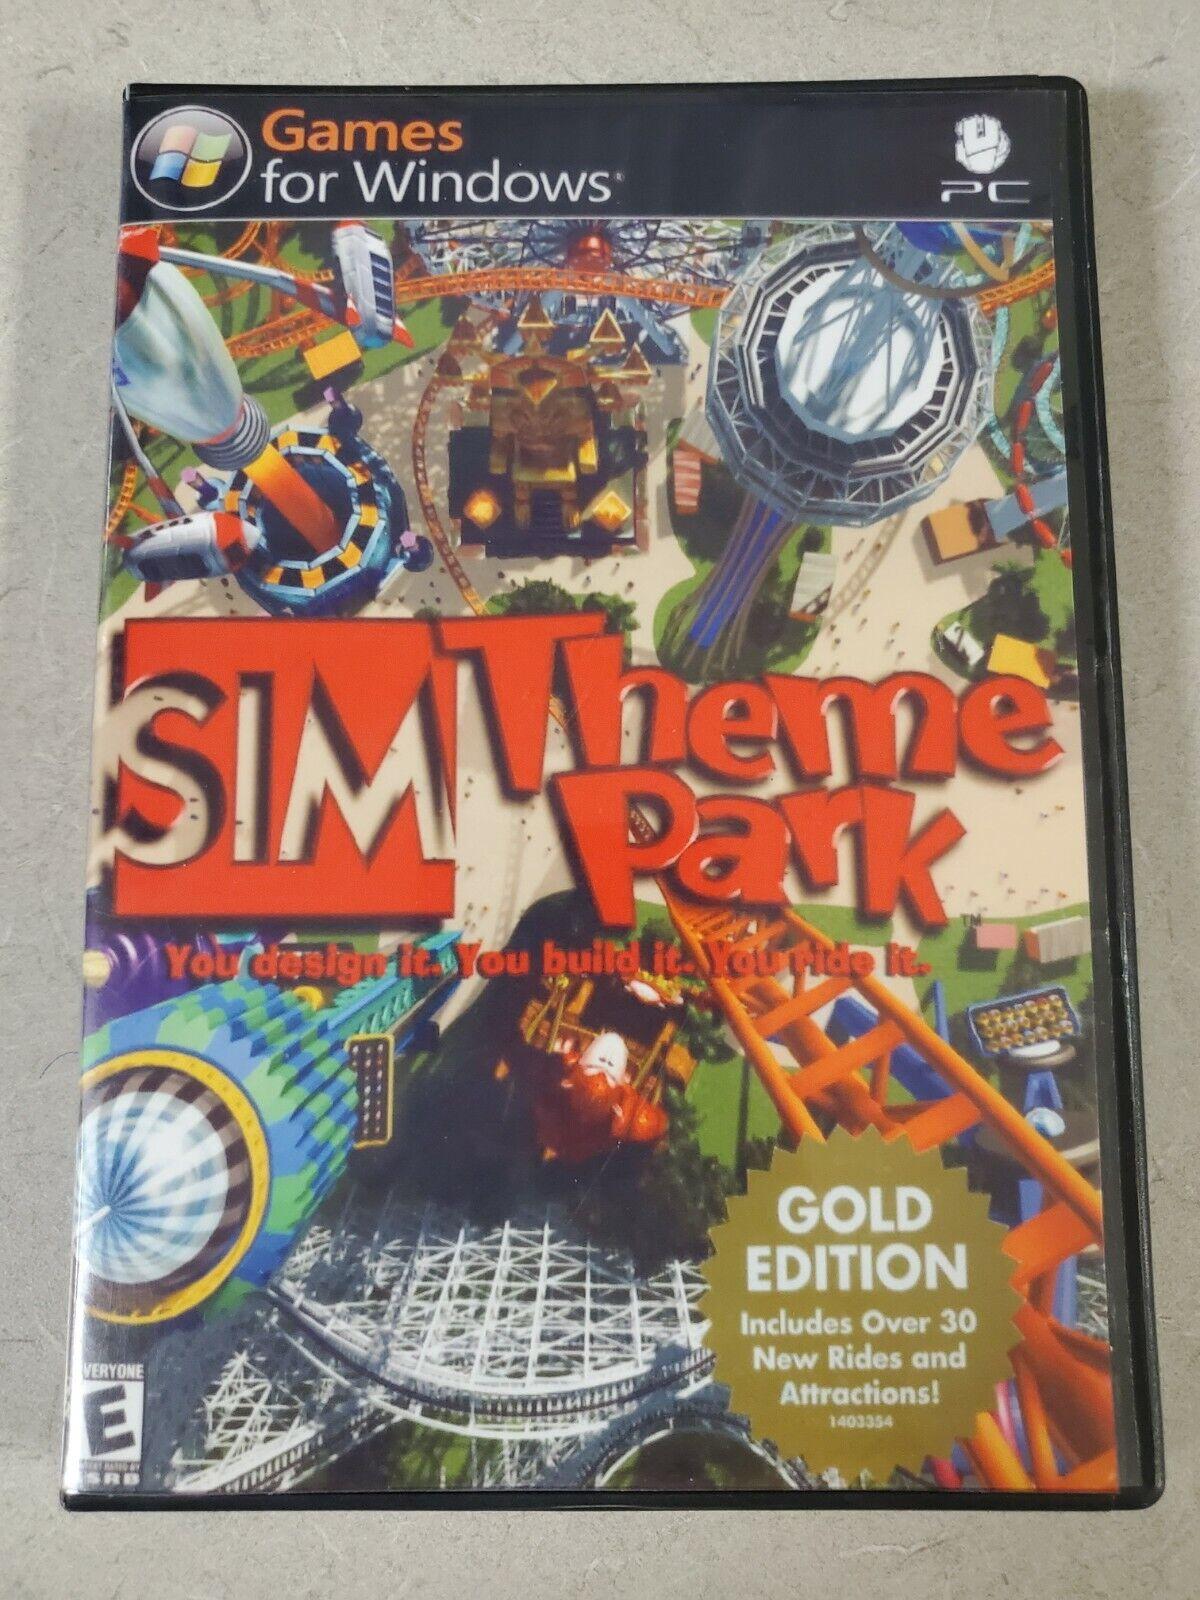 Image 1 - SIM Theme Park Gold Edition (Windows PC, 2002) ~ 2 Disc Set Custom Cover Art